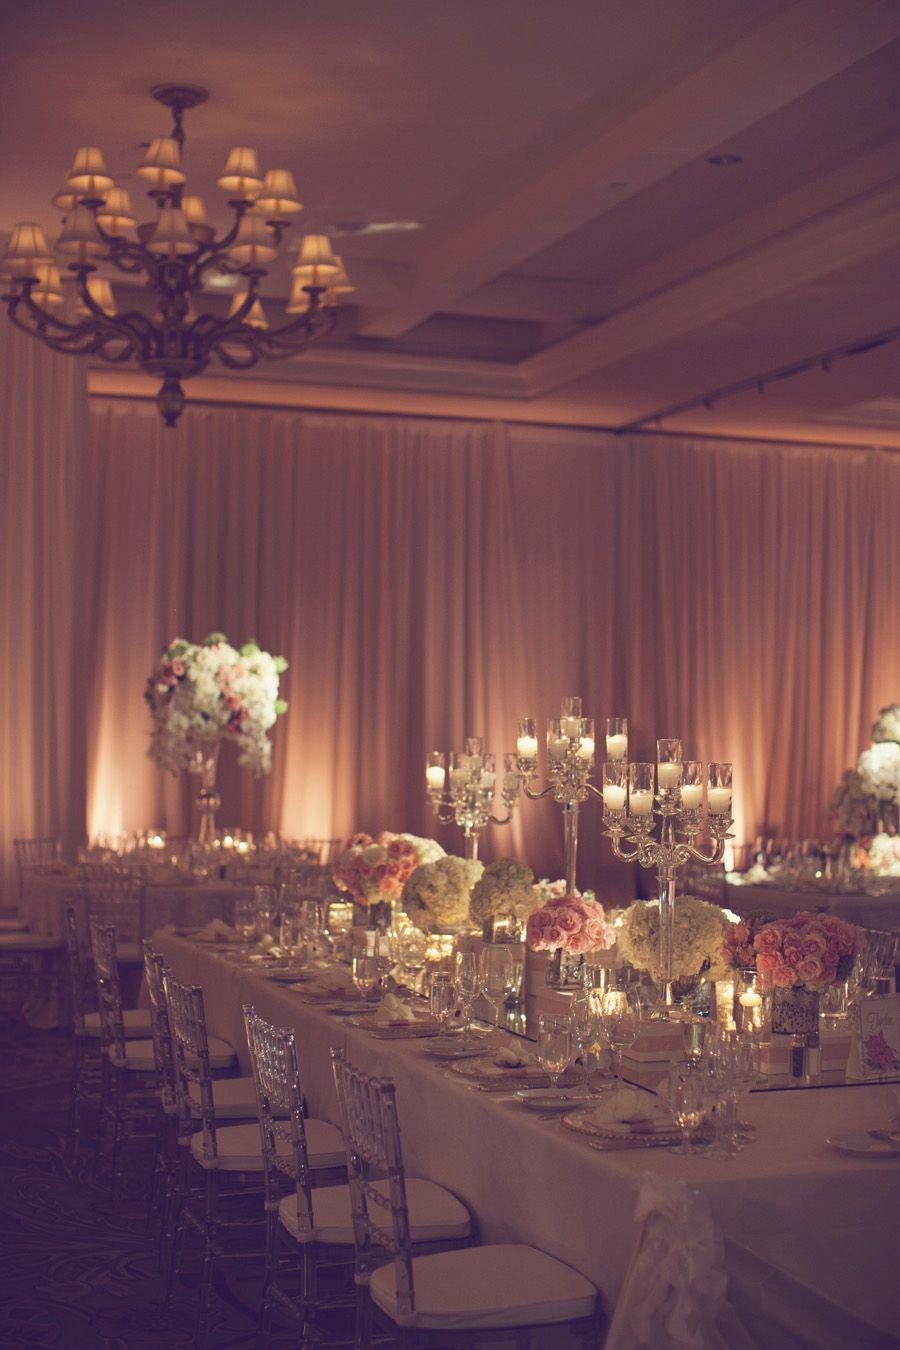 Wedding Reception Wall Draping | Reception, Centerpieces ...